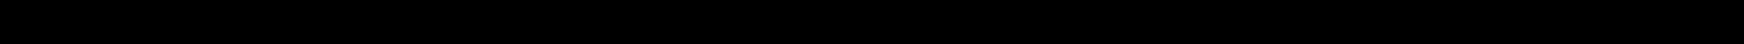 NeutrafaceSlabDisplayPro-Medium.otf